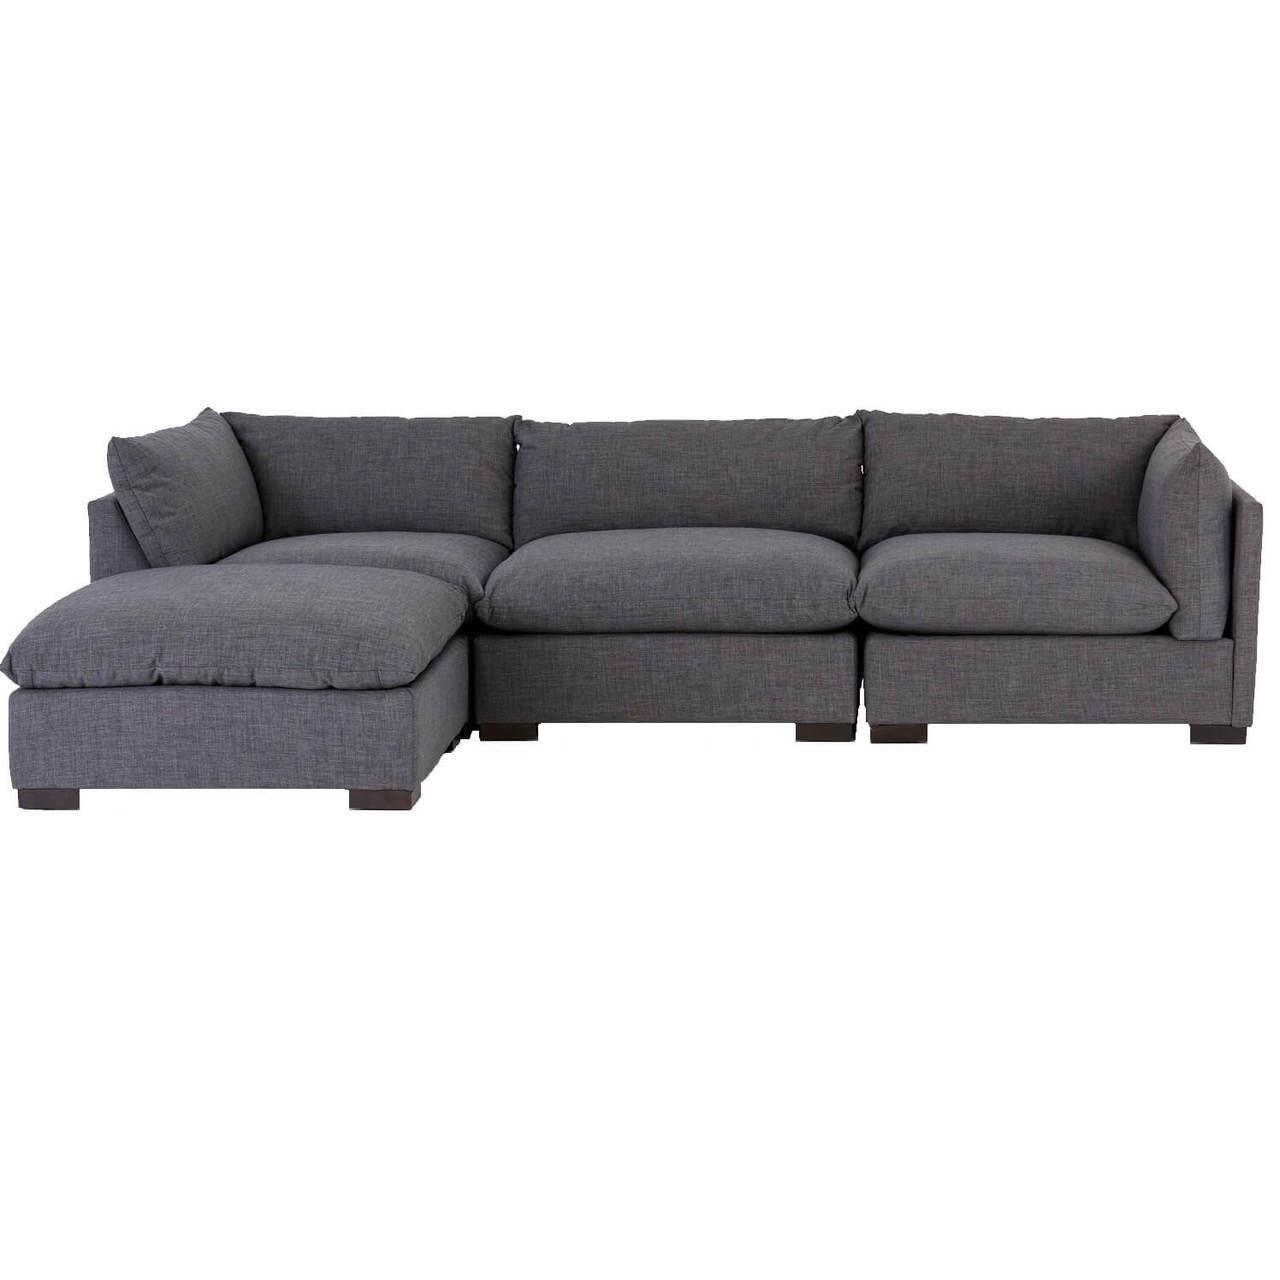 Westworld Modern Gray 4 Piece Modular Lounge Sectional